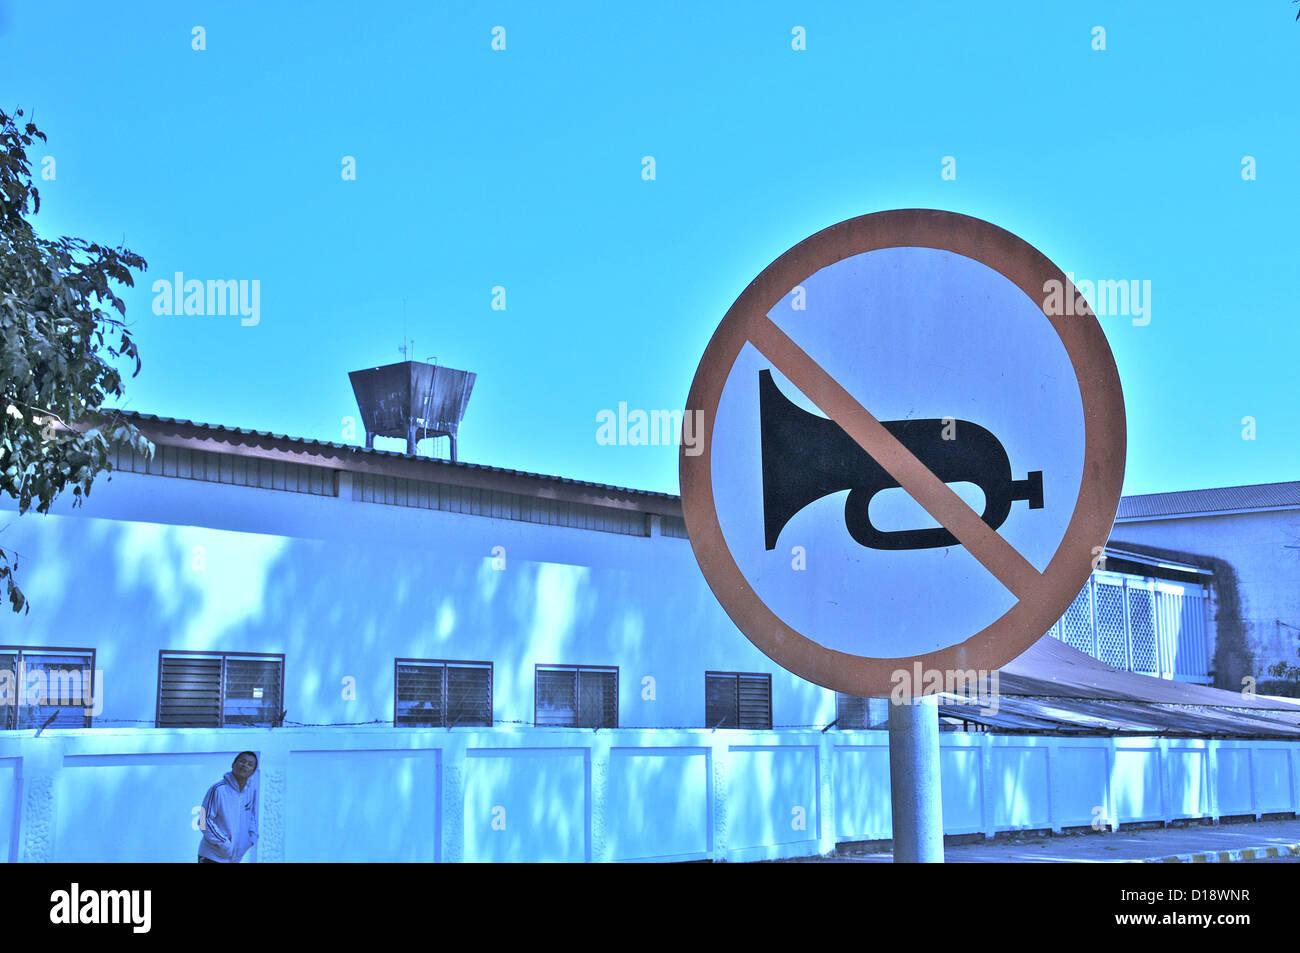 road sign defense of honk Vientiane Laos - Stock Image